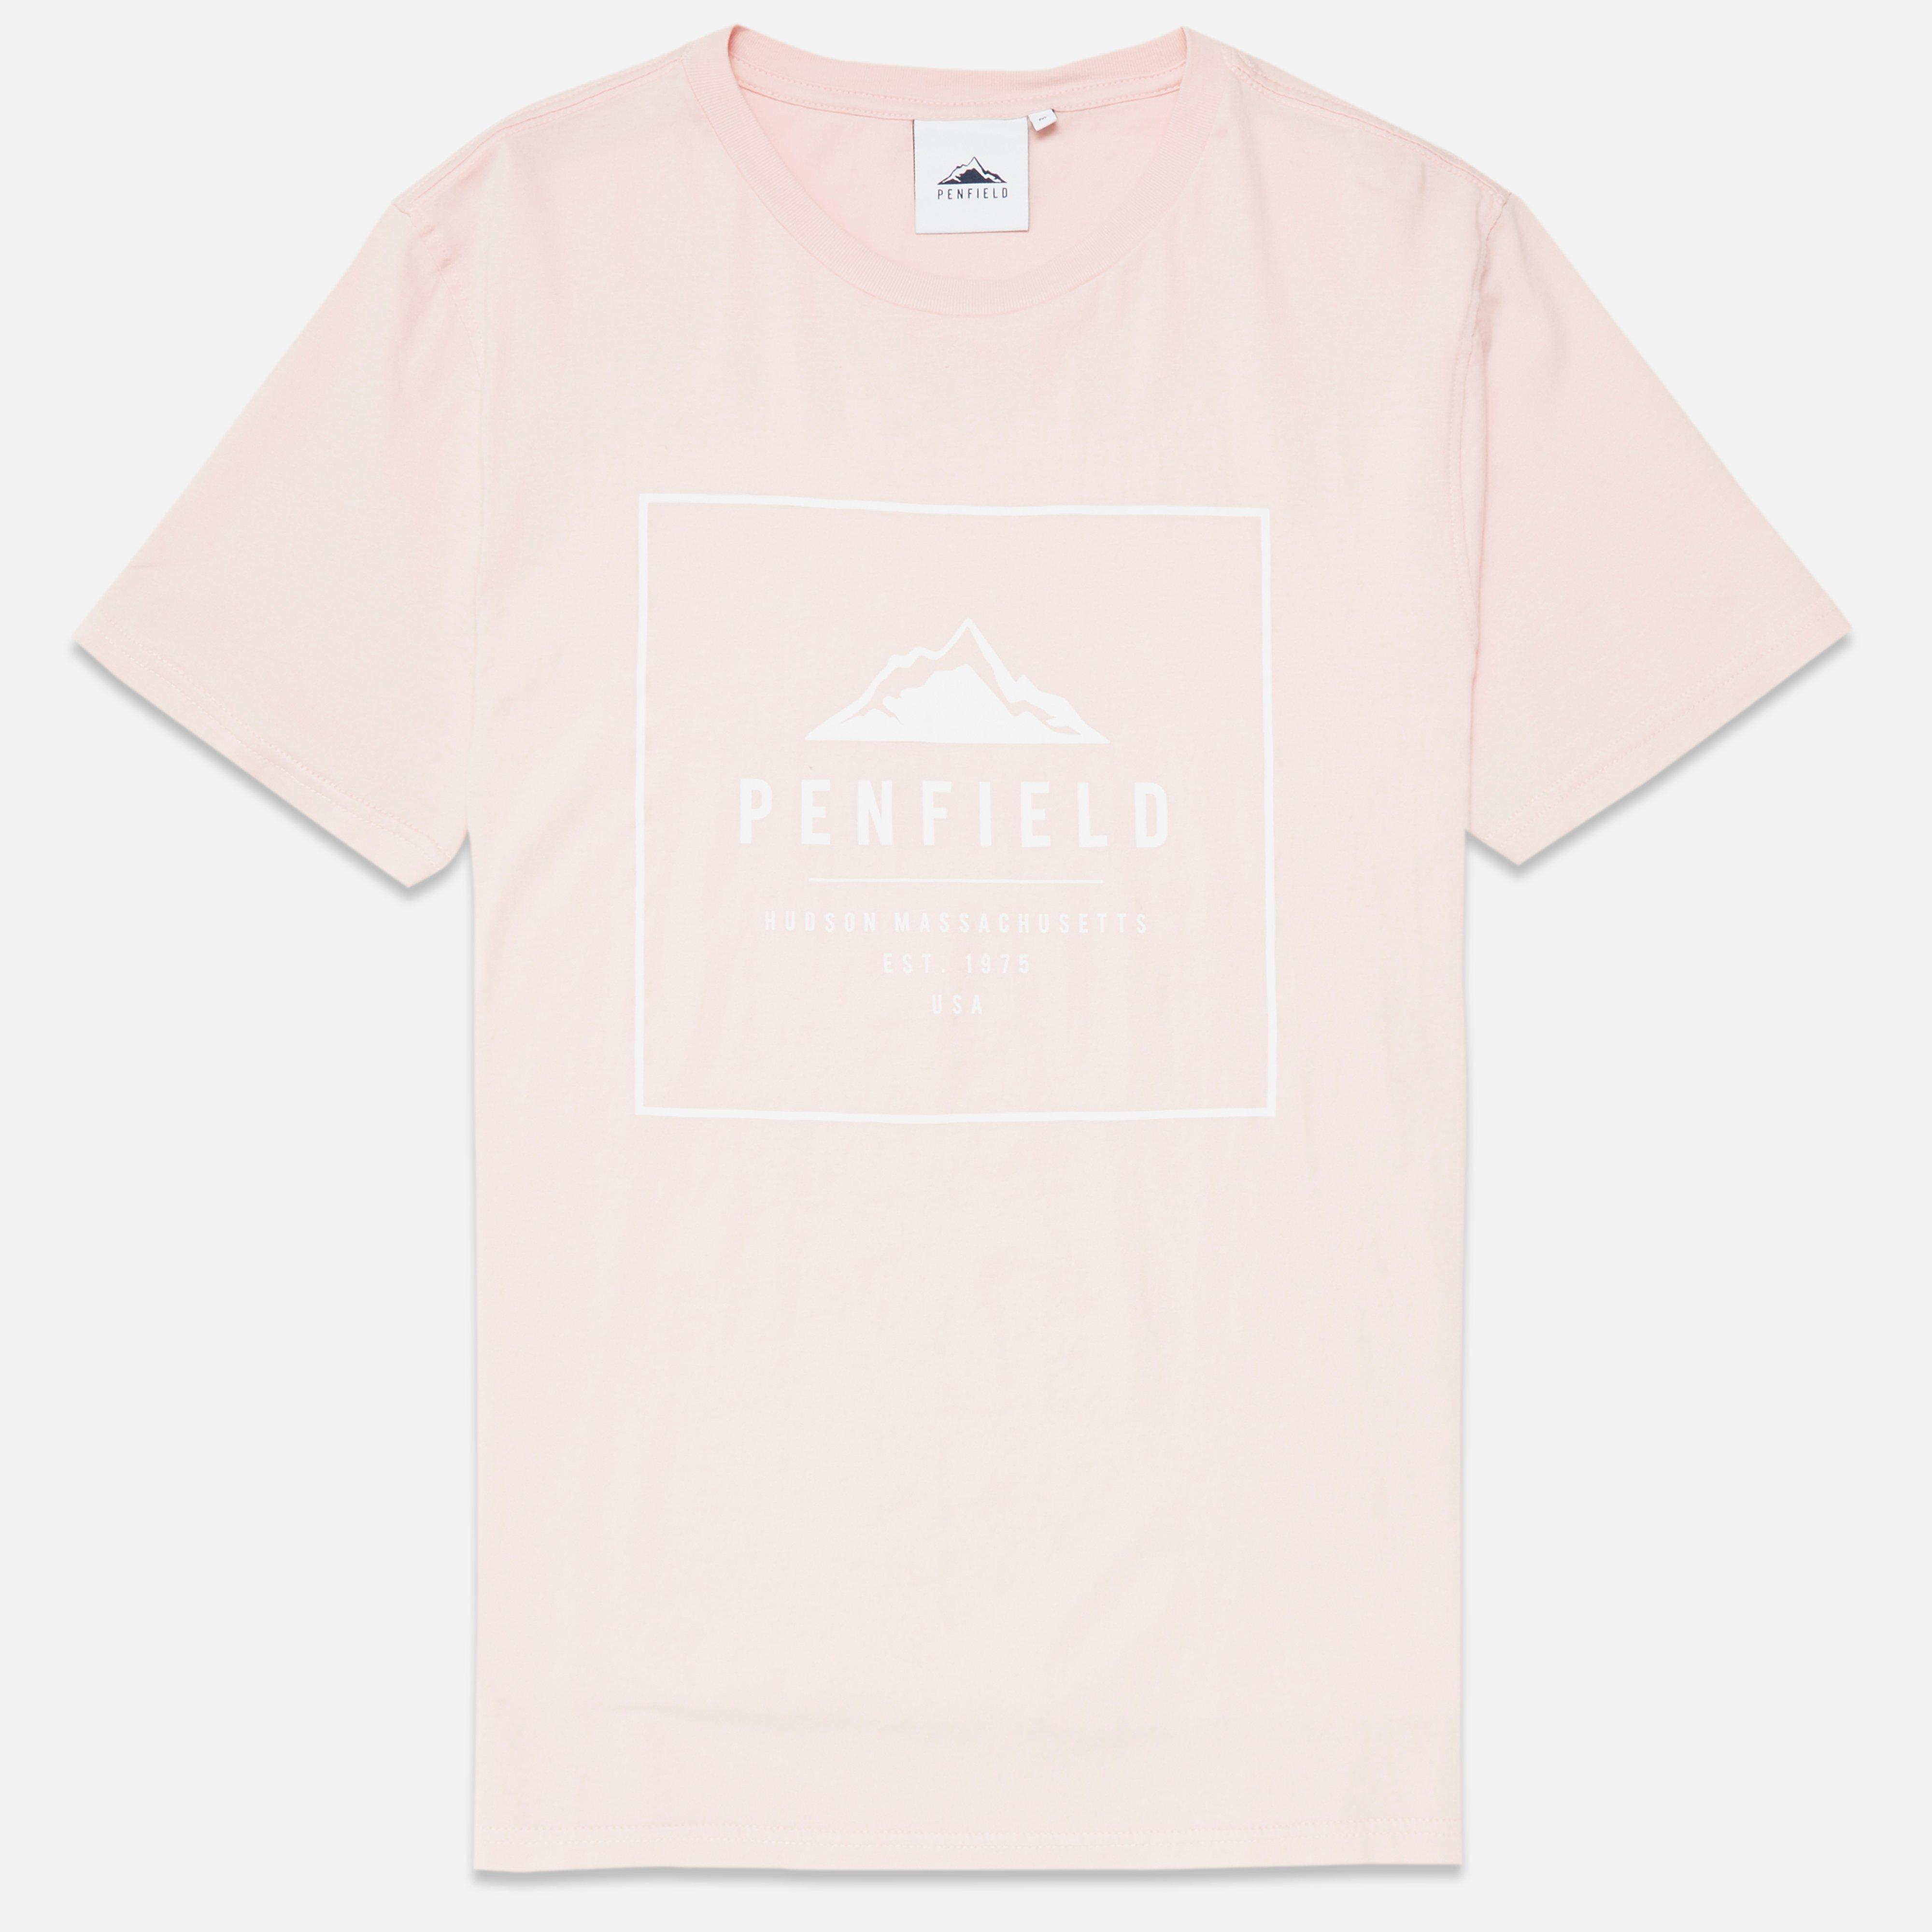 Penfield Alcala T-shirt